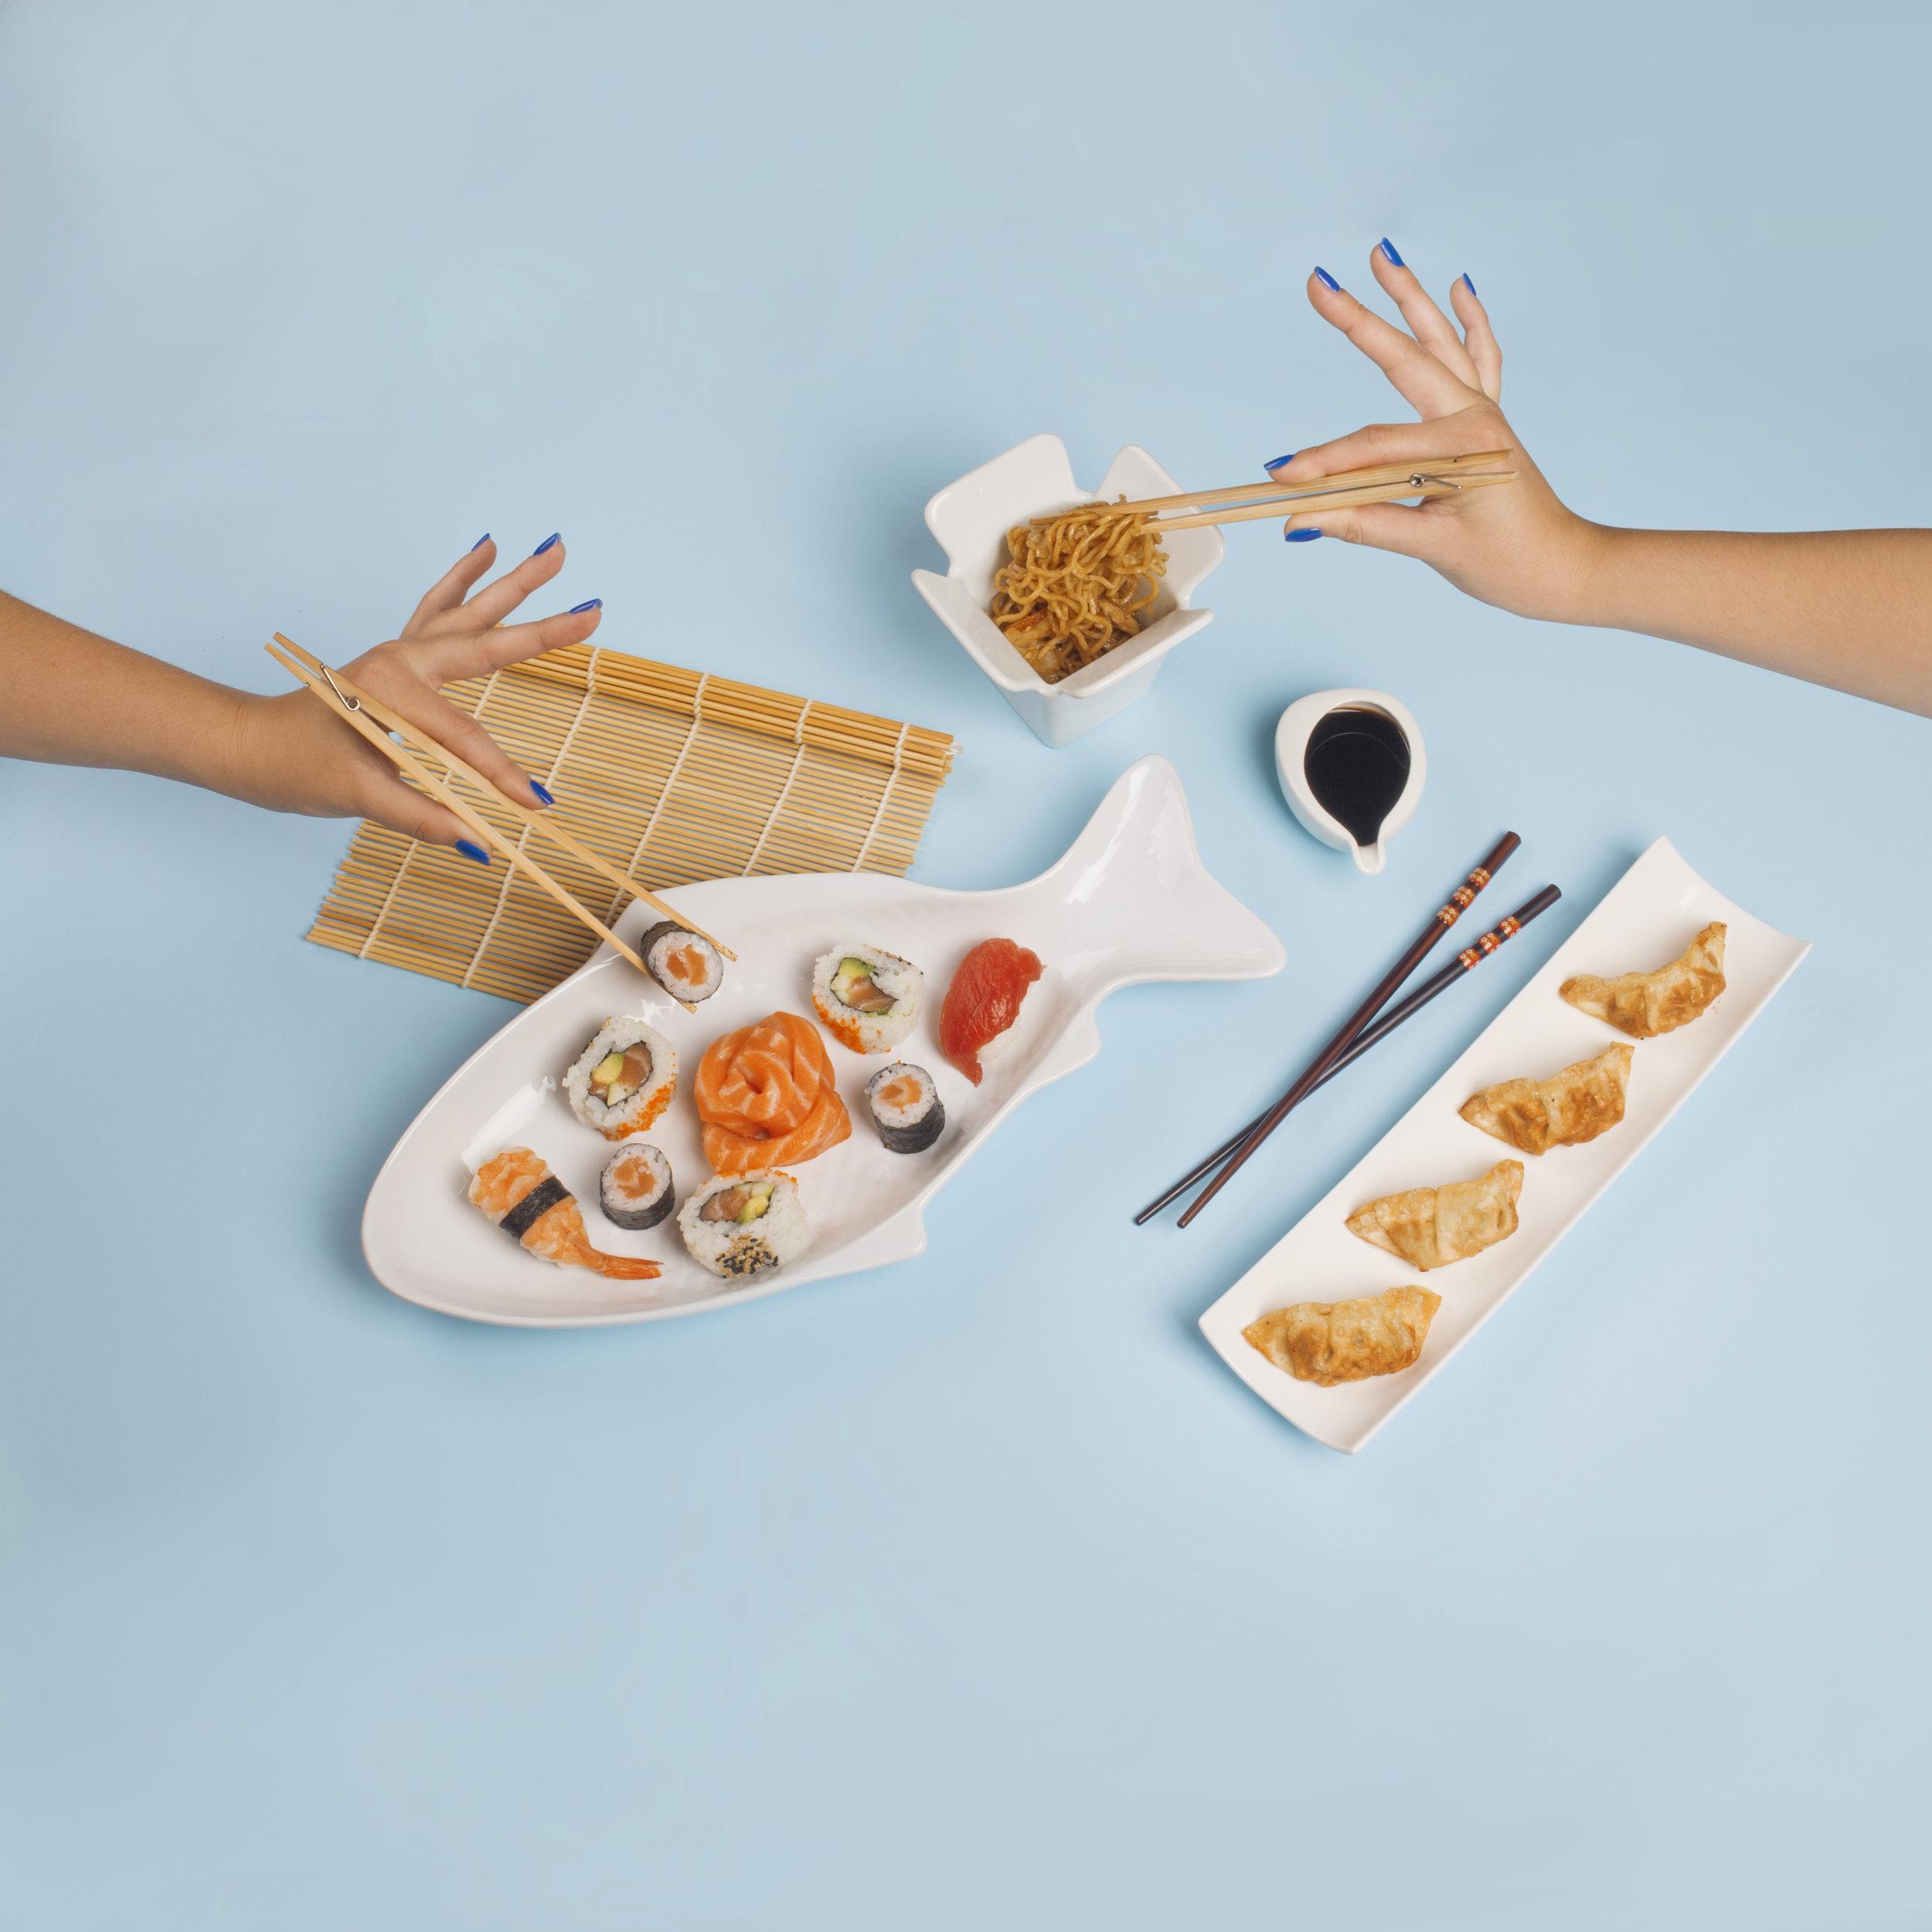 June 18th - International Sushi Day